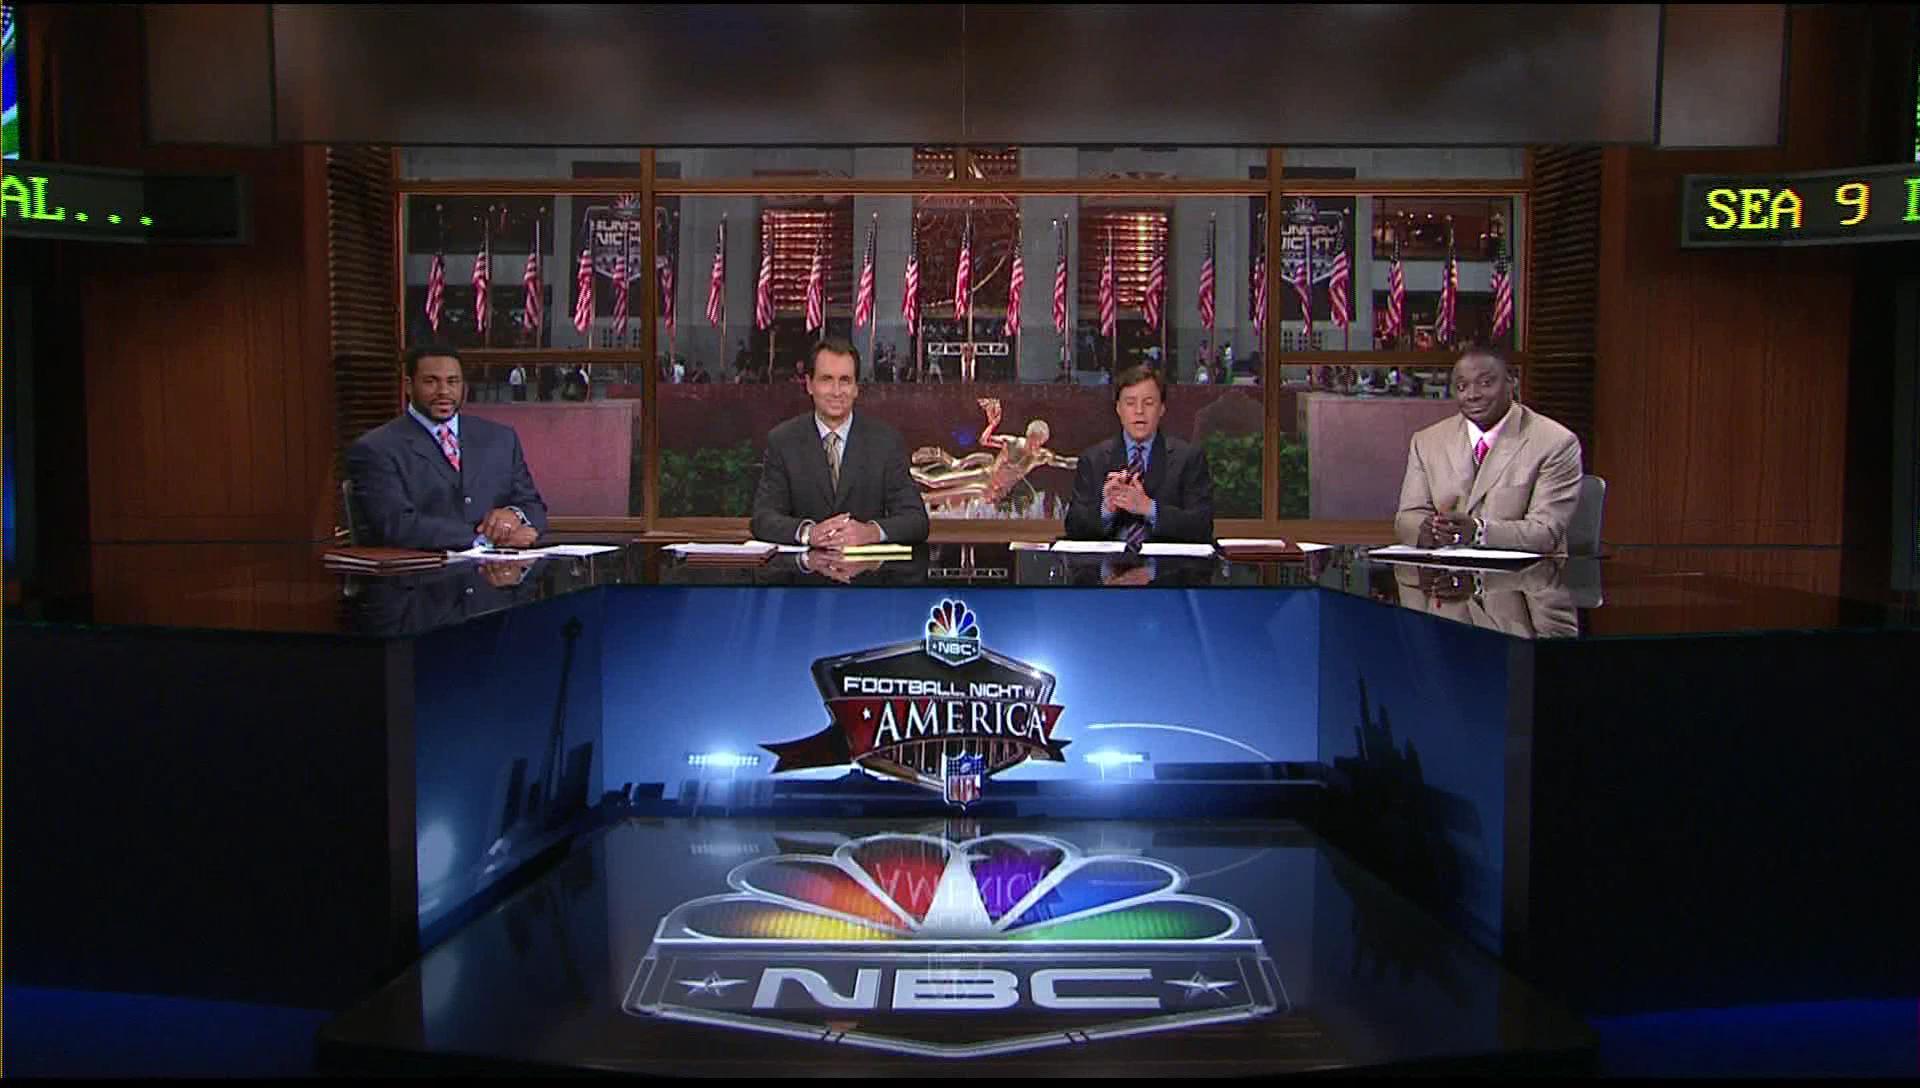 NBC Sports Studio 8G Broadcast Set Design Gallery